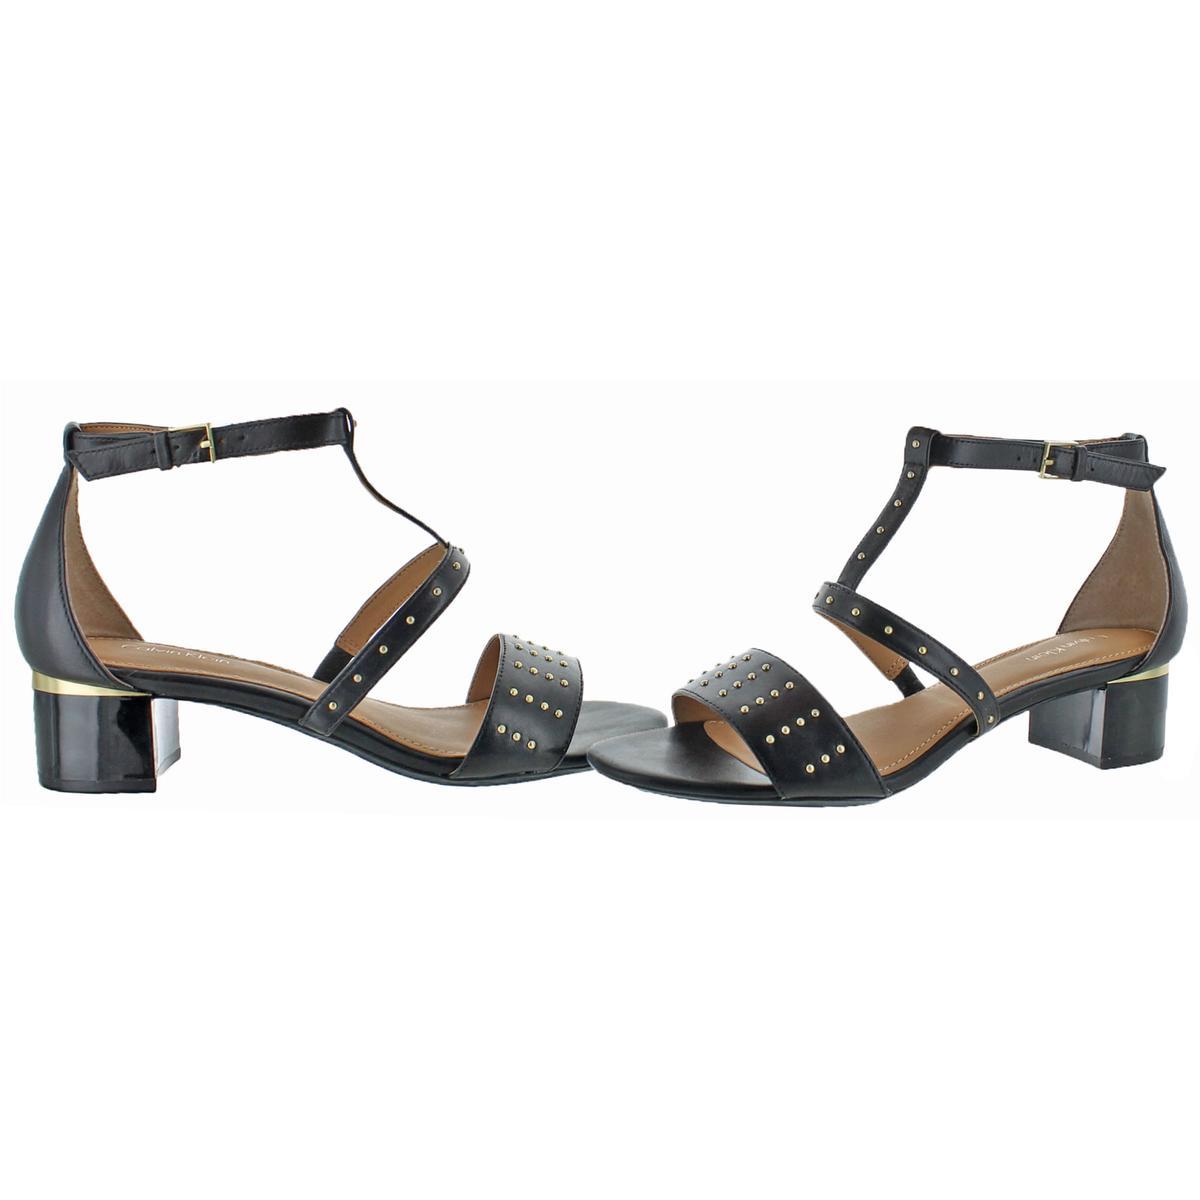 Calvin-Klein-Divina-Women-039-s-Open-Toe-Studded-Block-Heel-Shoes thumbnail 3